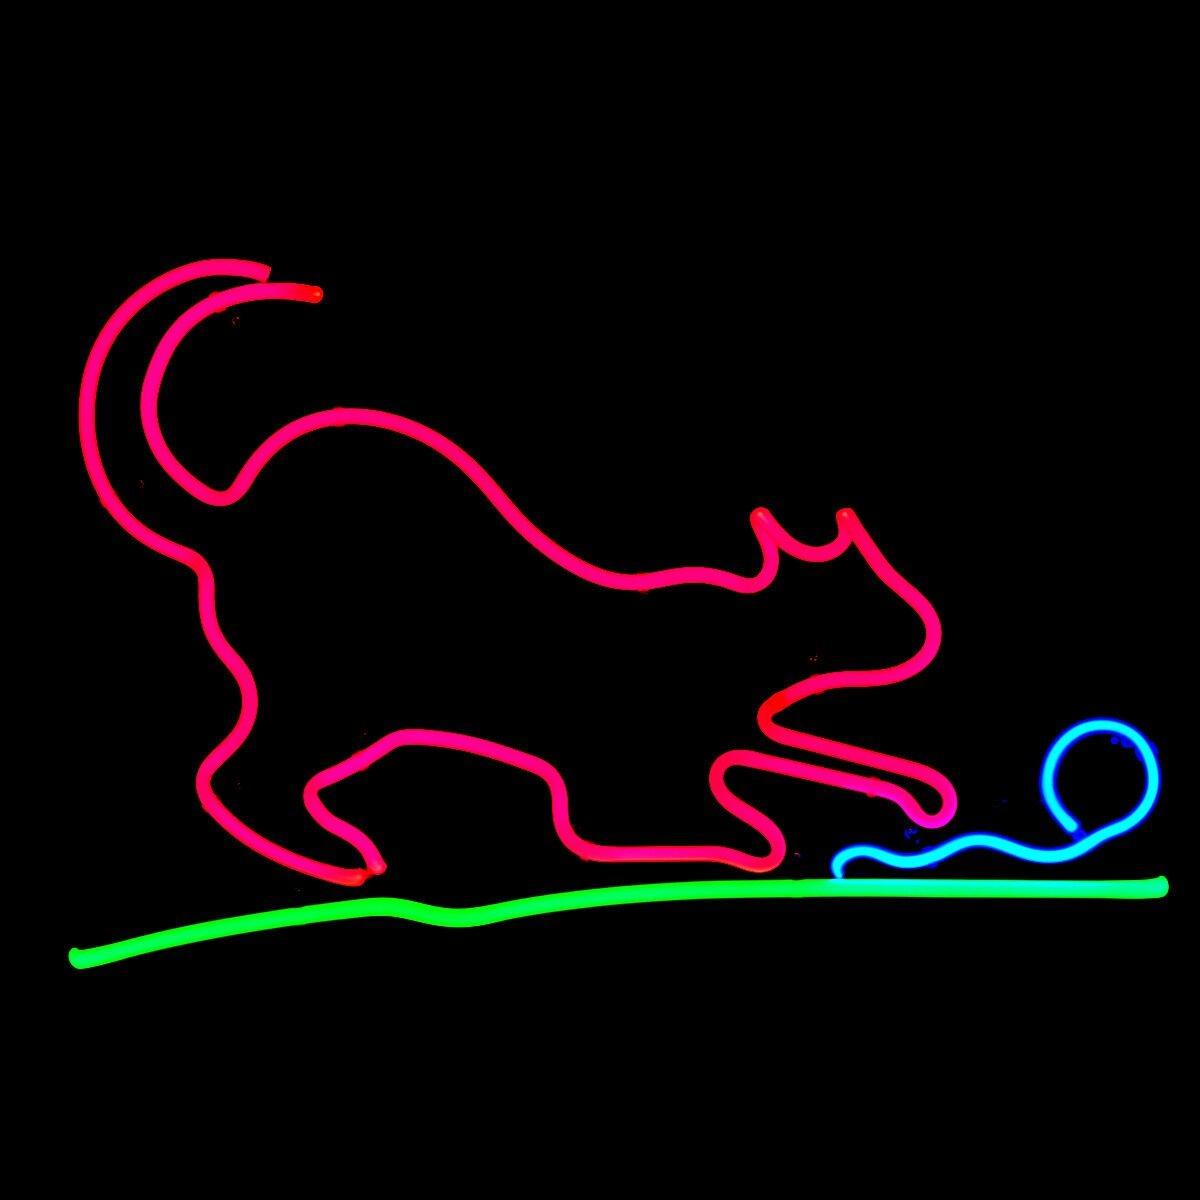 CAT DESIGNER NEON LIGHT SCULPTURE - by John Barton - BartonNeonMagic.com